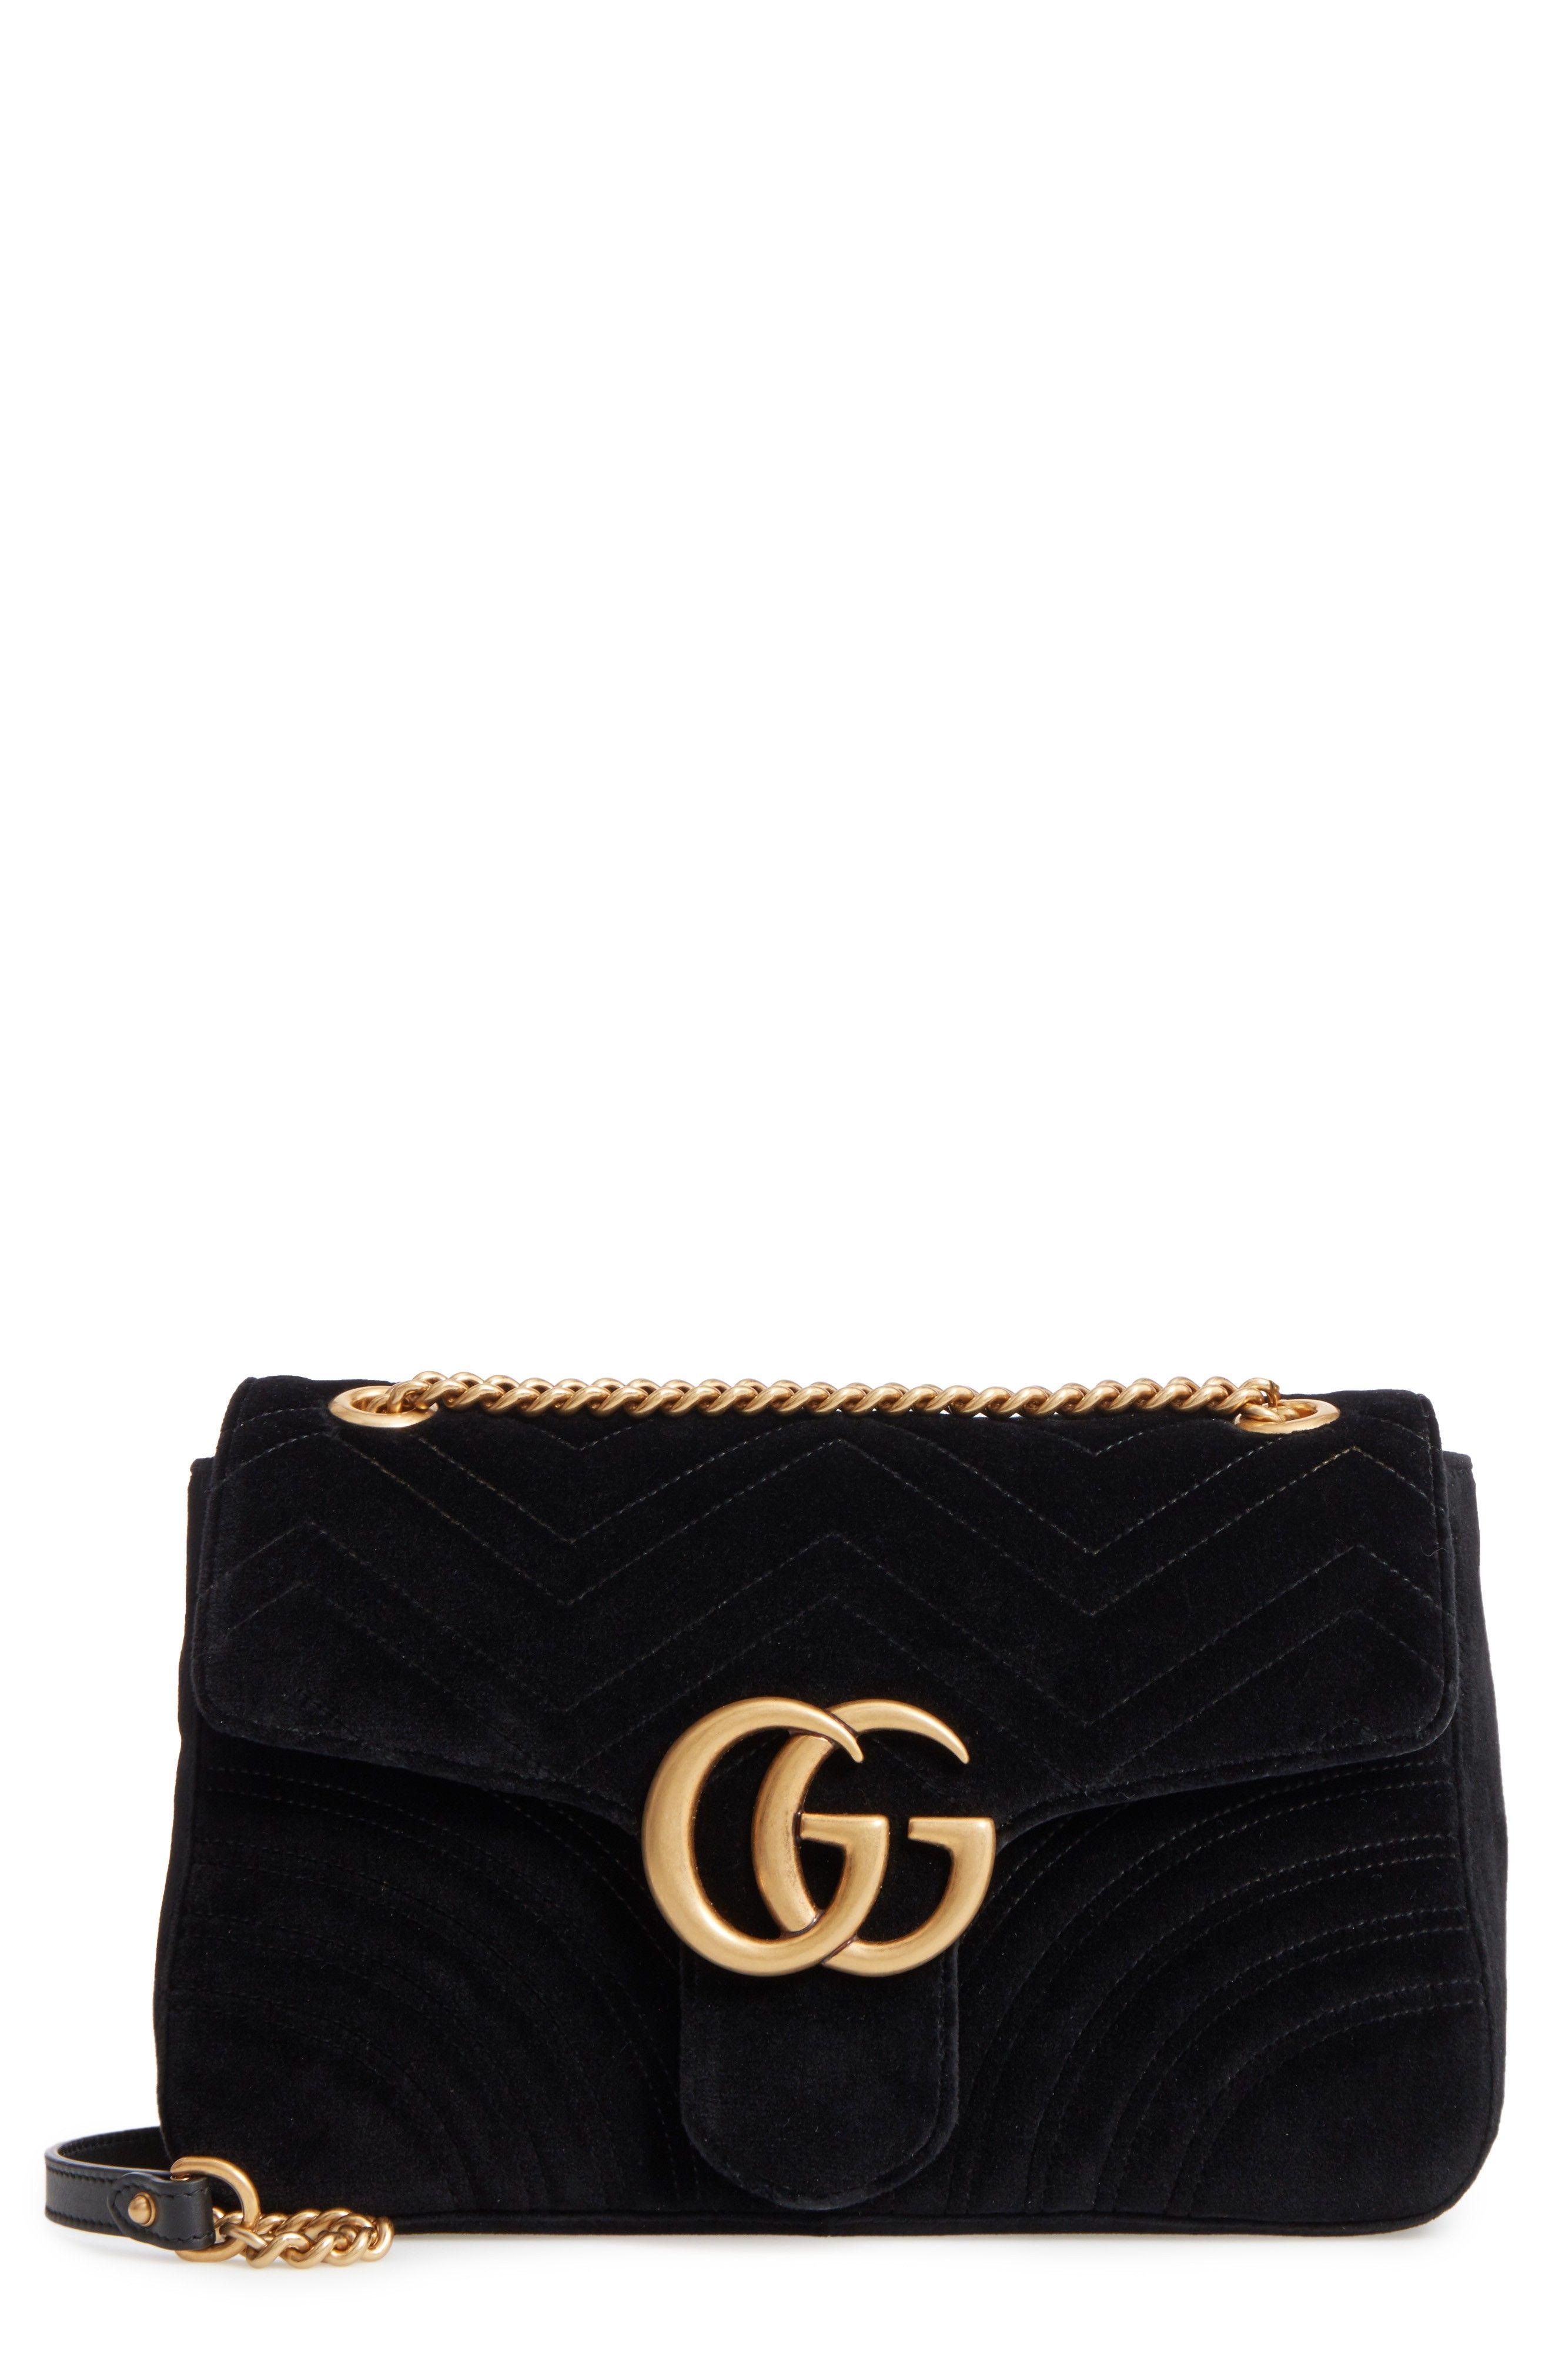 6ba4259d6f1 Medium GG Marmont 2.0 Matelassé Velvet Shoulder Bag